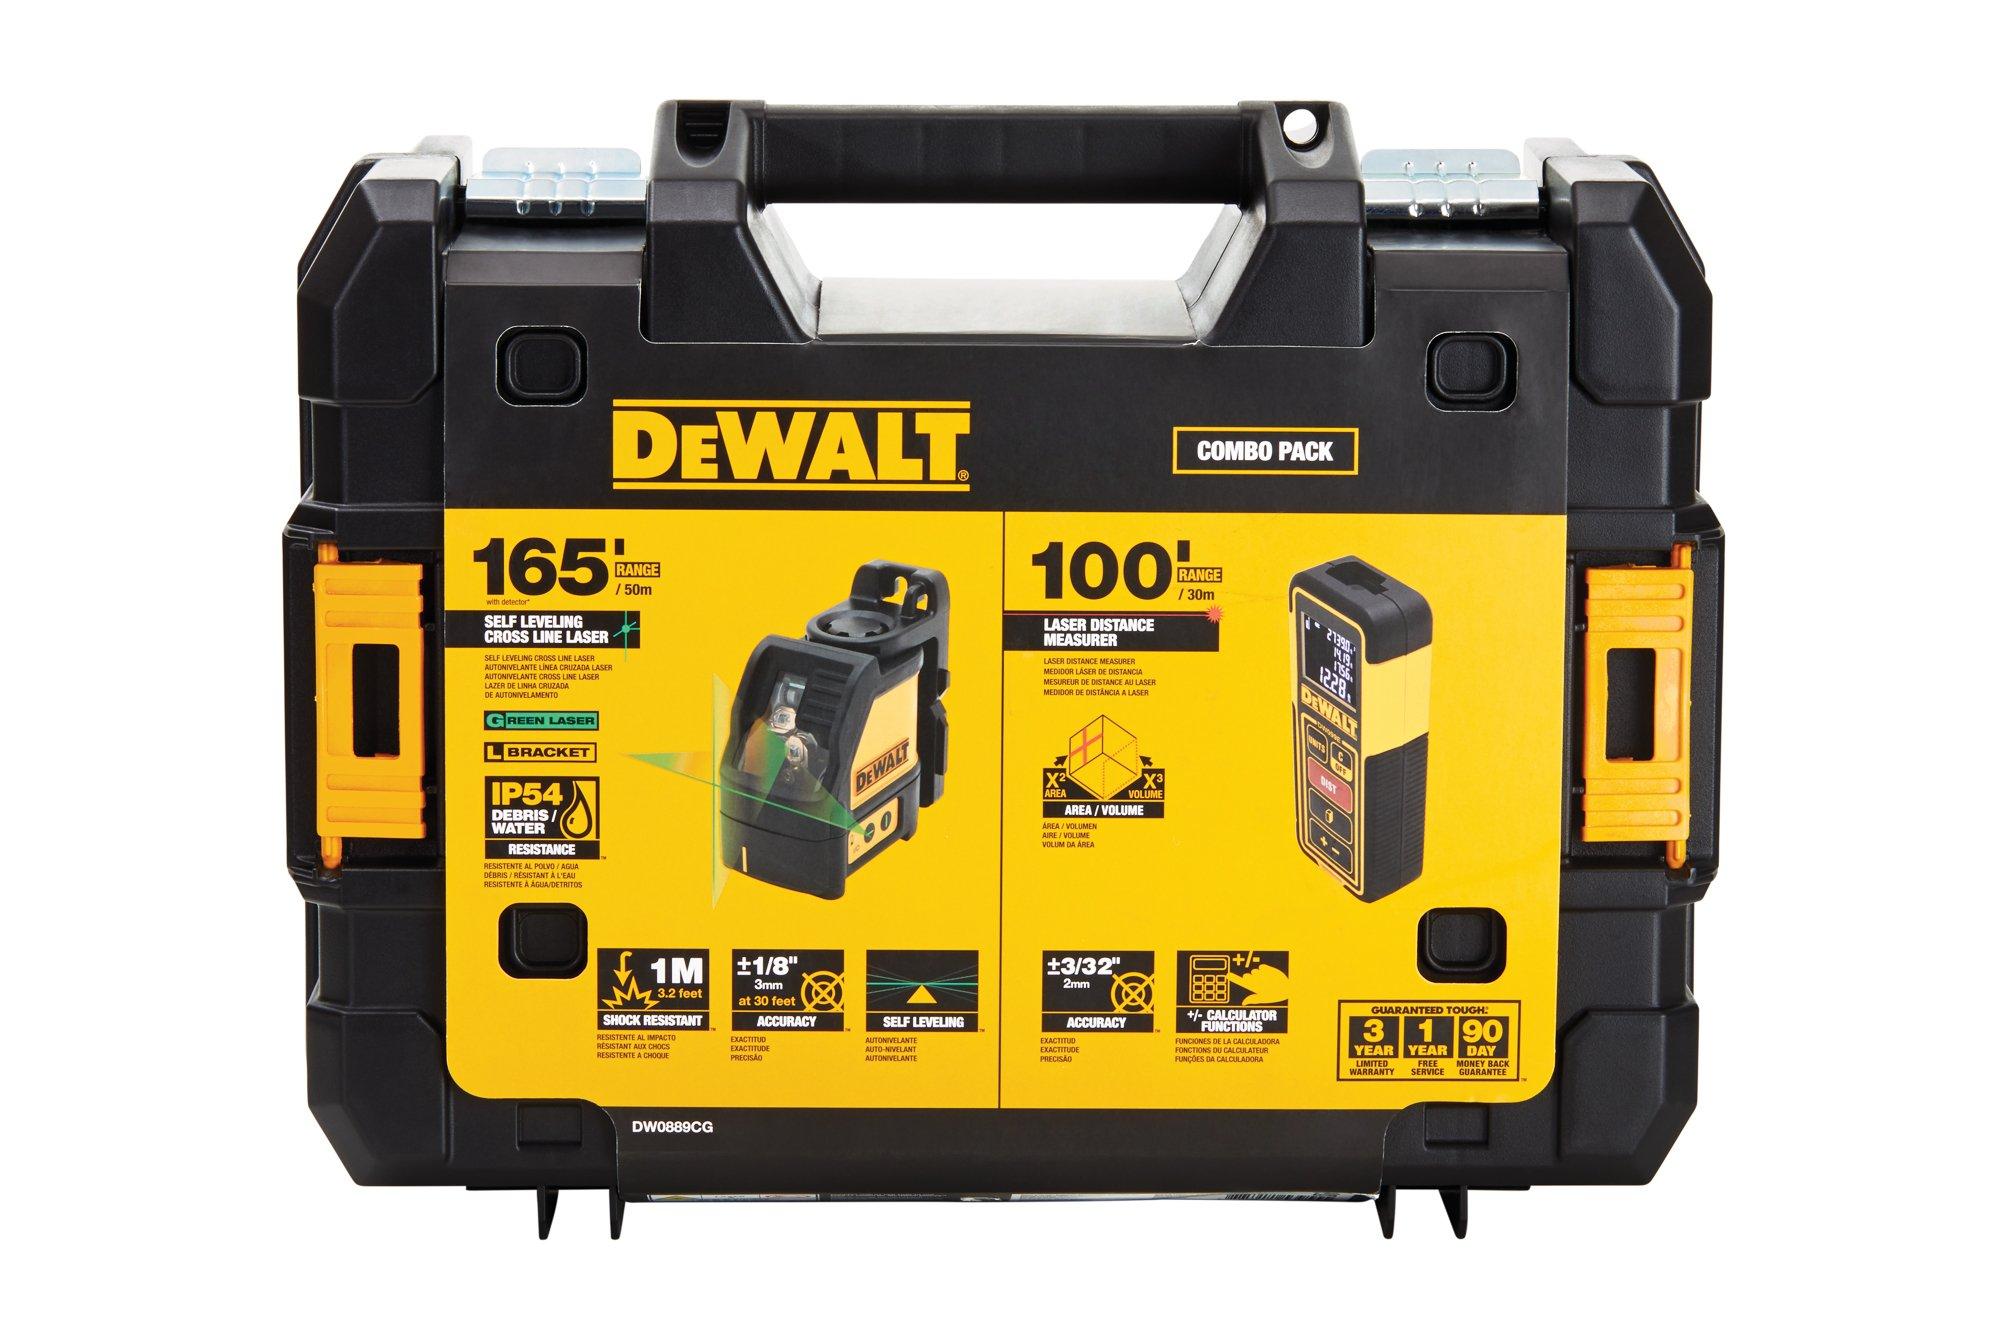 DEWALT DW0889CG TSTAK Laser Kit: DW088CG 12V Cross Line + DW099E 99ft Laser Distance Measurer by DEWALT